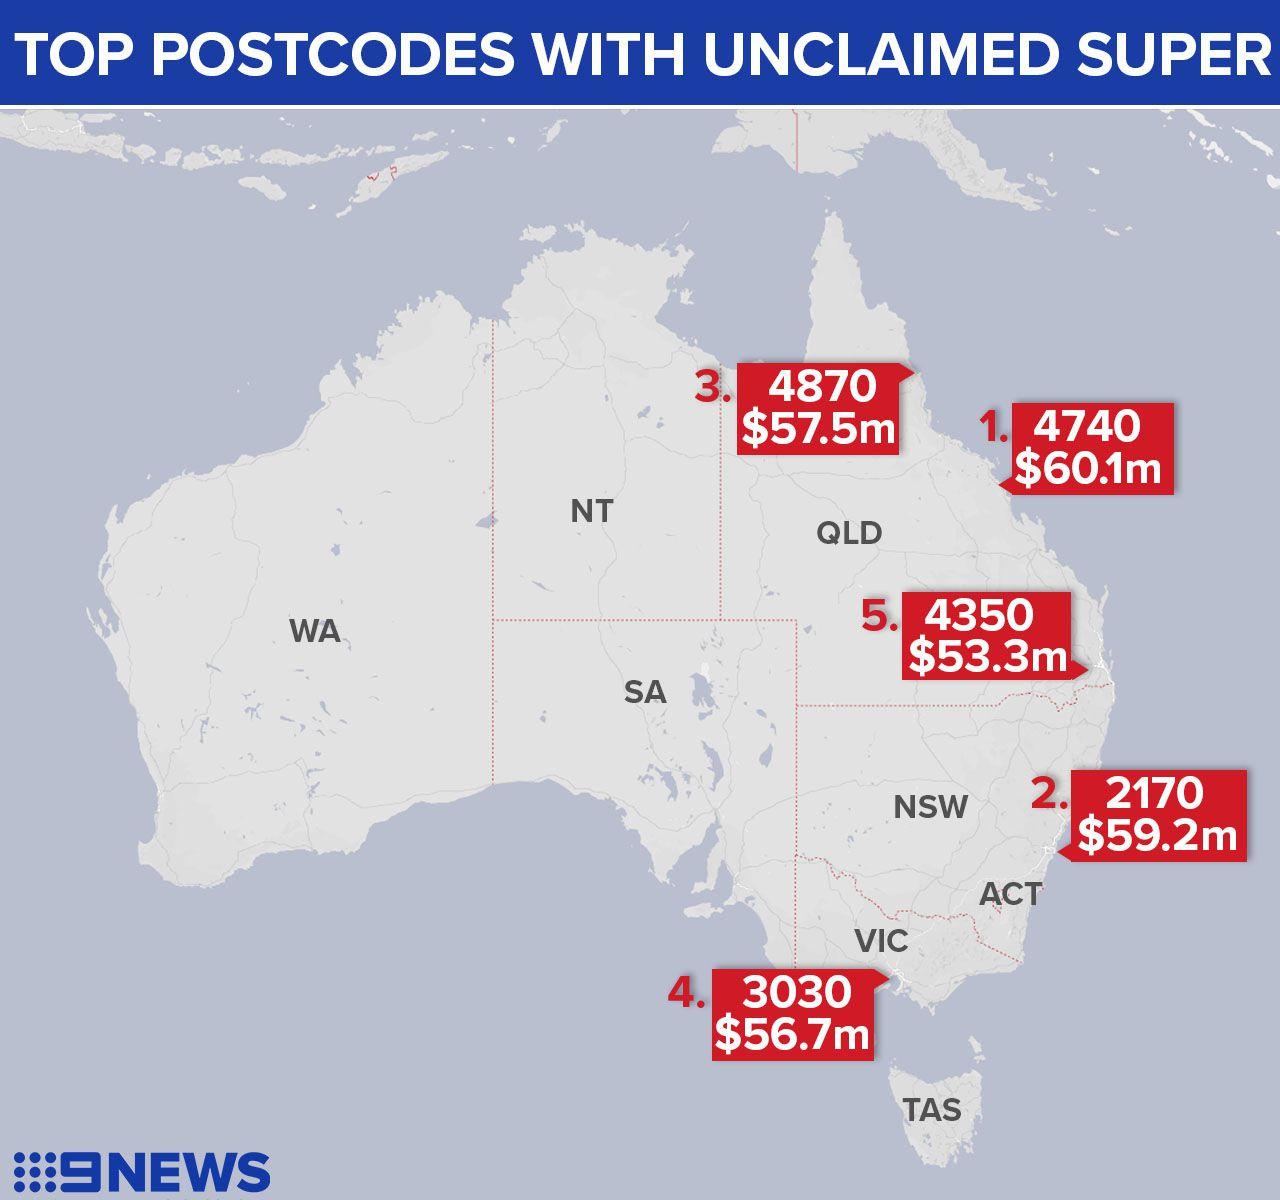 Australians have 'lost' $17 5b in super